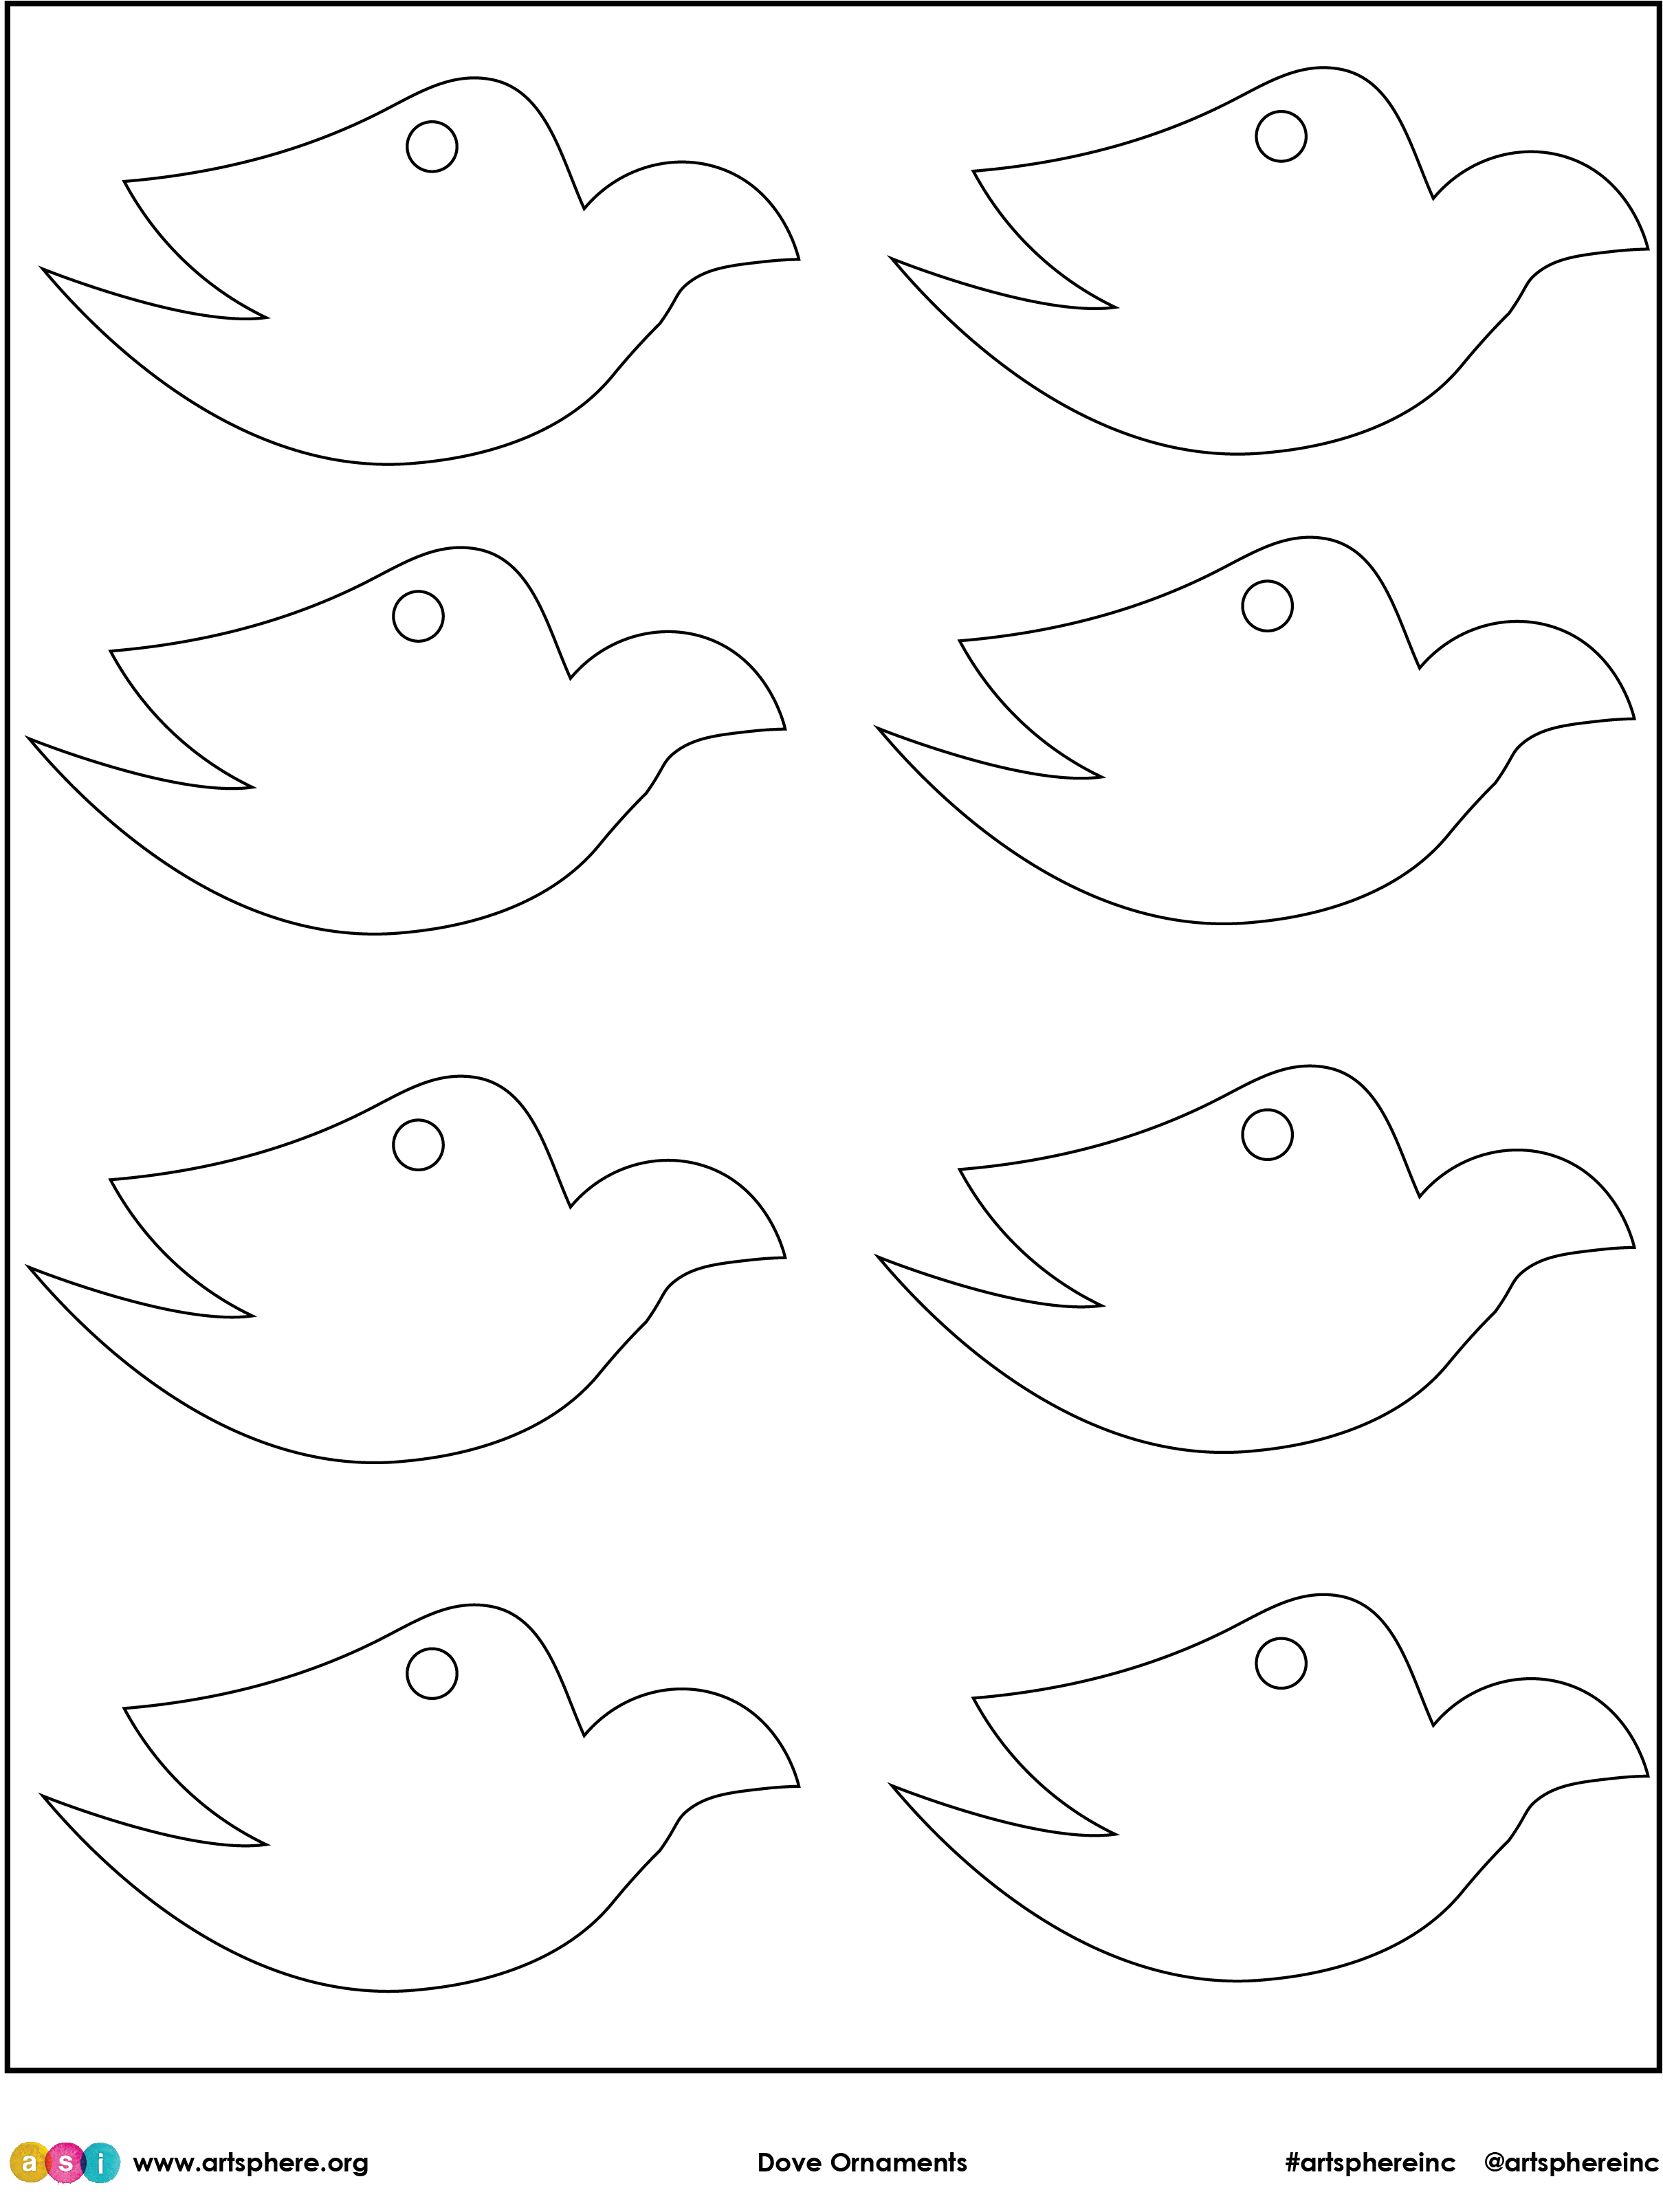 Dove Ornaments Handout